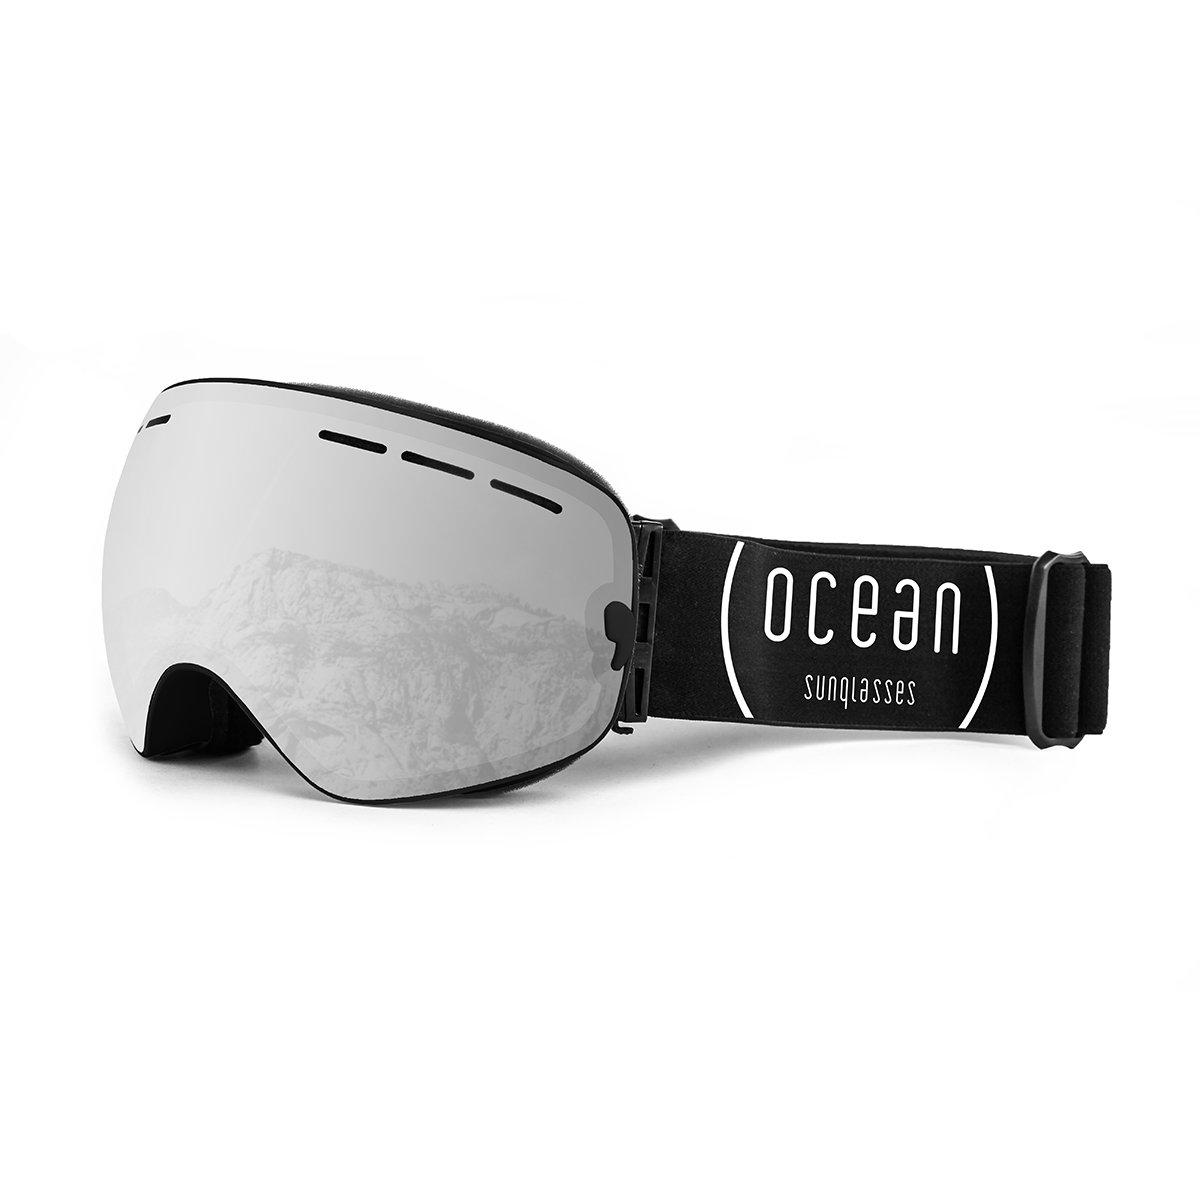 Ocean Sunglasses Cervino - Masque - Monture : Noir - Verres : Photochromatique (YH-3109.0) Rb43GmfAz